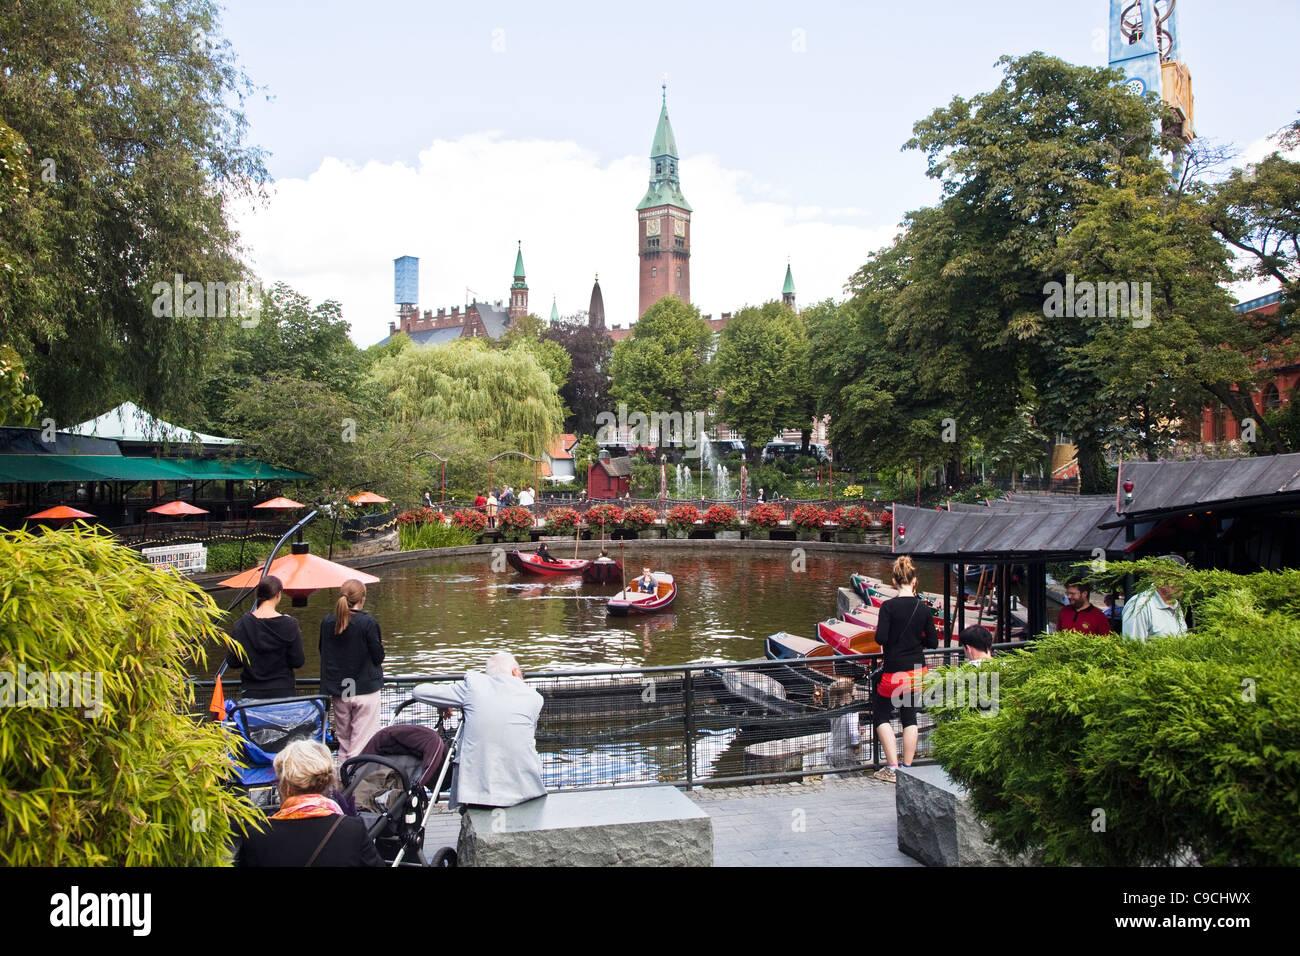 Les Jardins De Tivoli A Copenhague Capitale Du Danemark Egalement